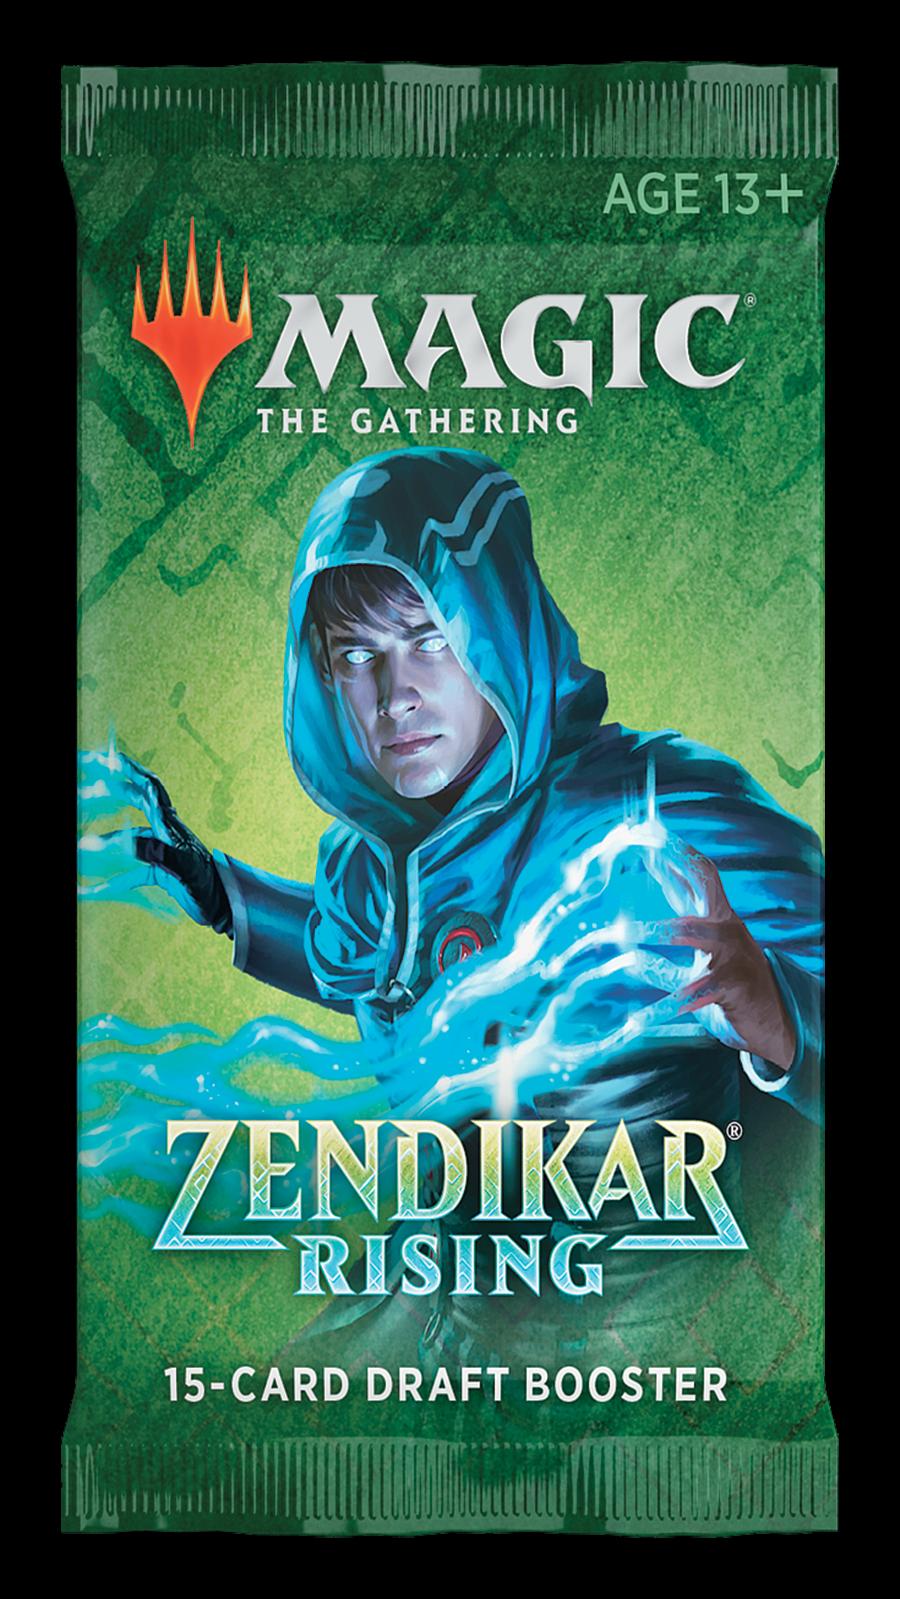 Magic the Gathering CCG: Zendikar Rising Draft Booster Pack